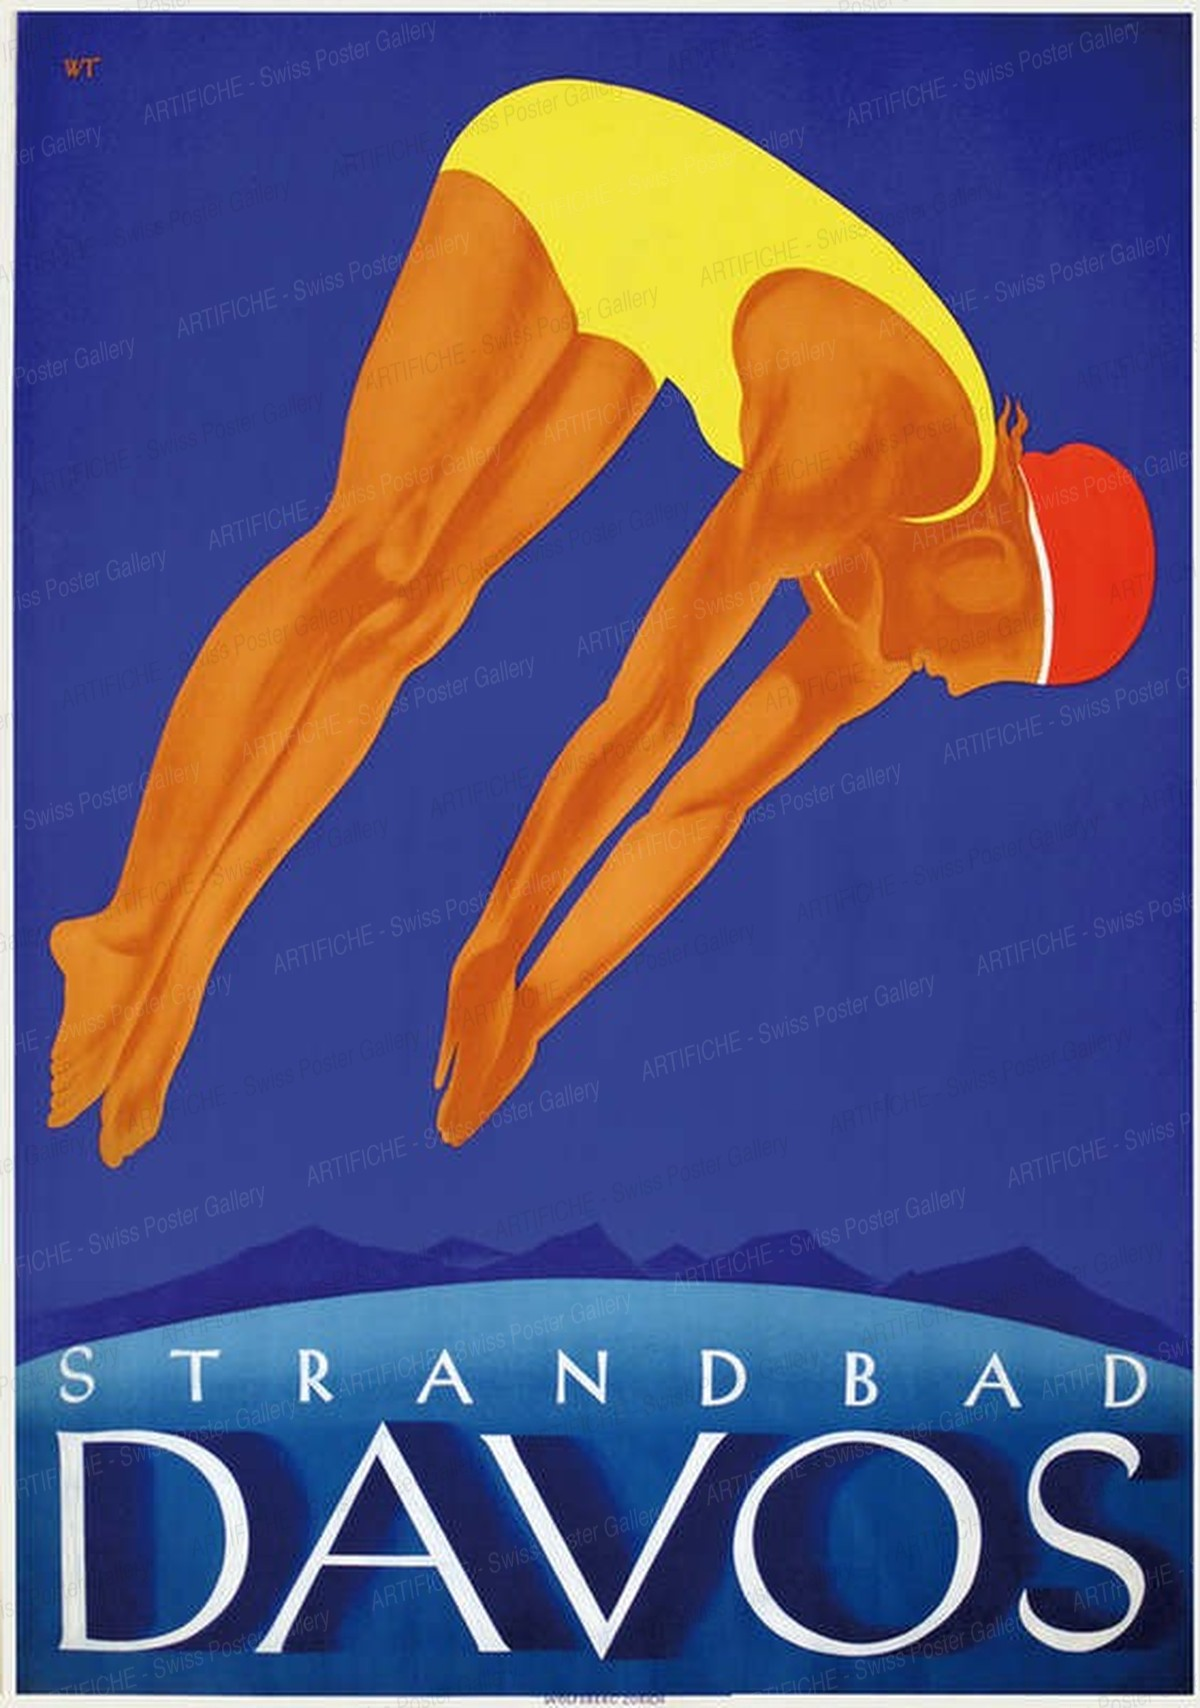 STRANDBAD DAVOS, Willy Trapp